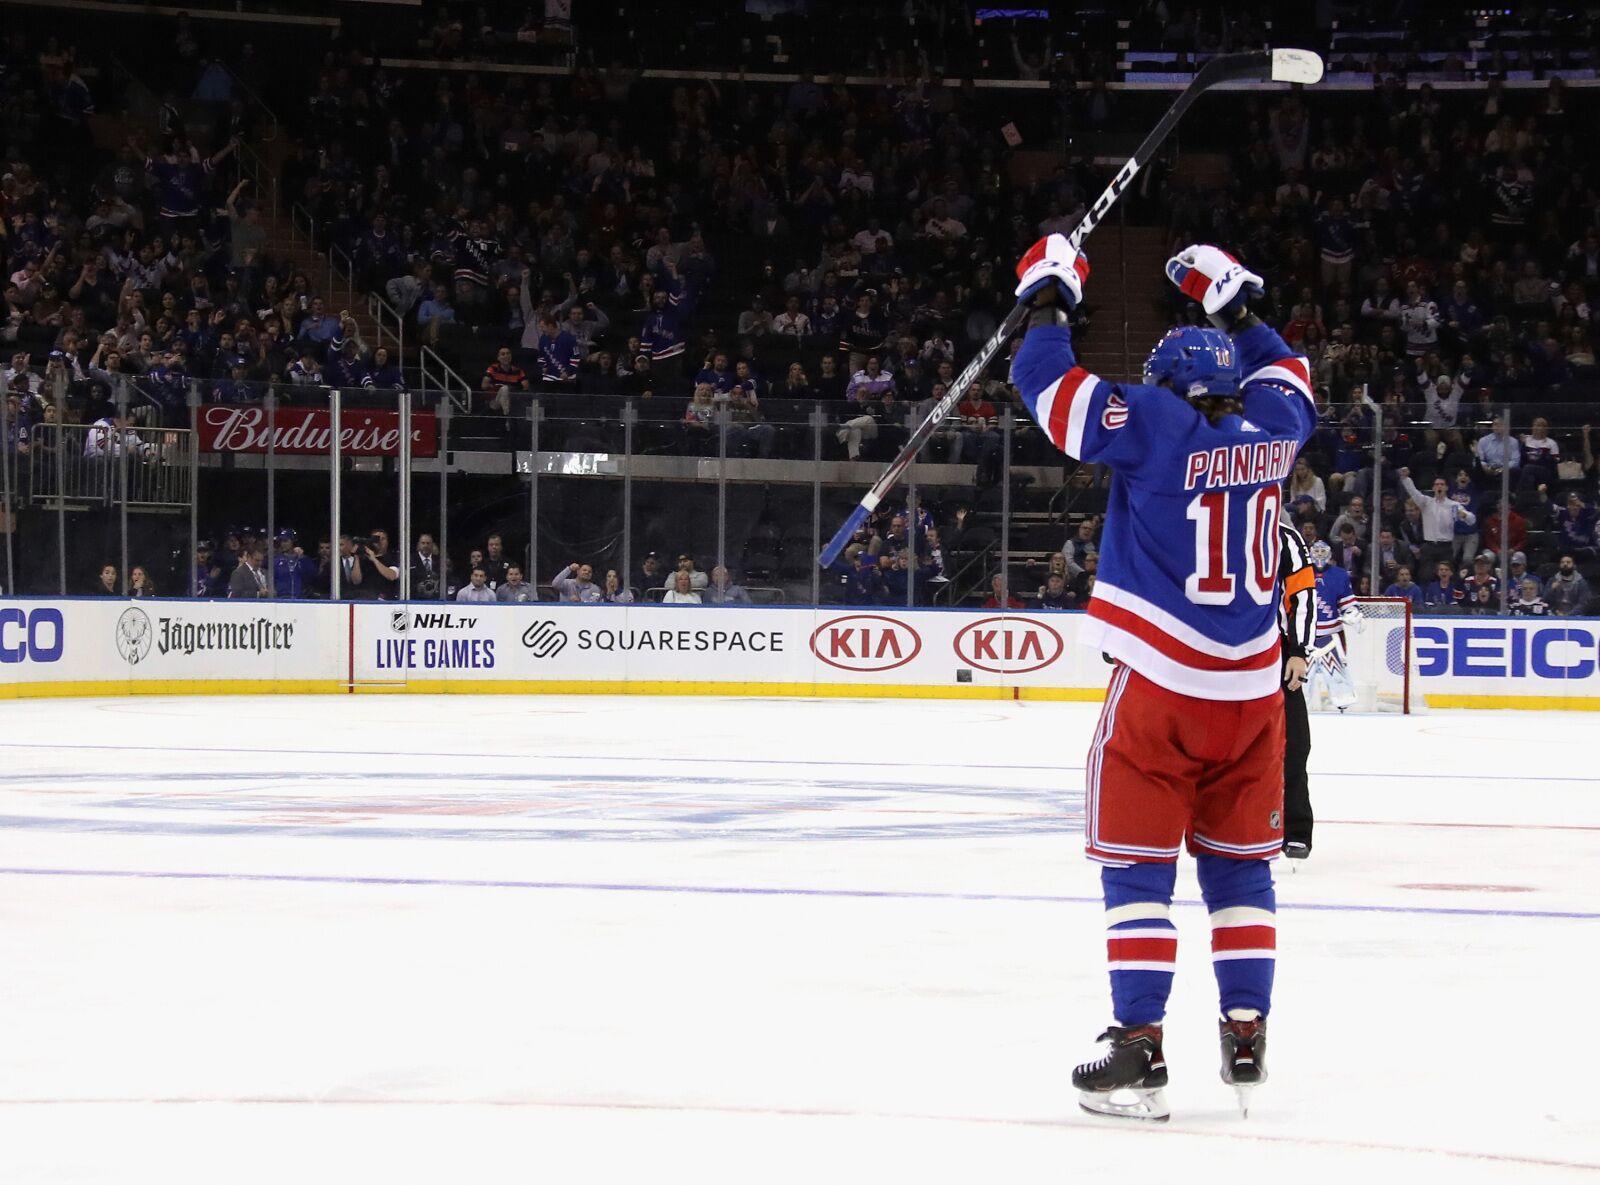 New York Rangers: No need to panic about Panarin